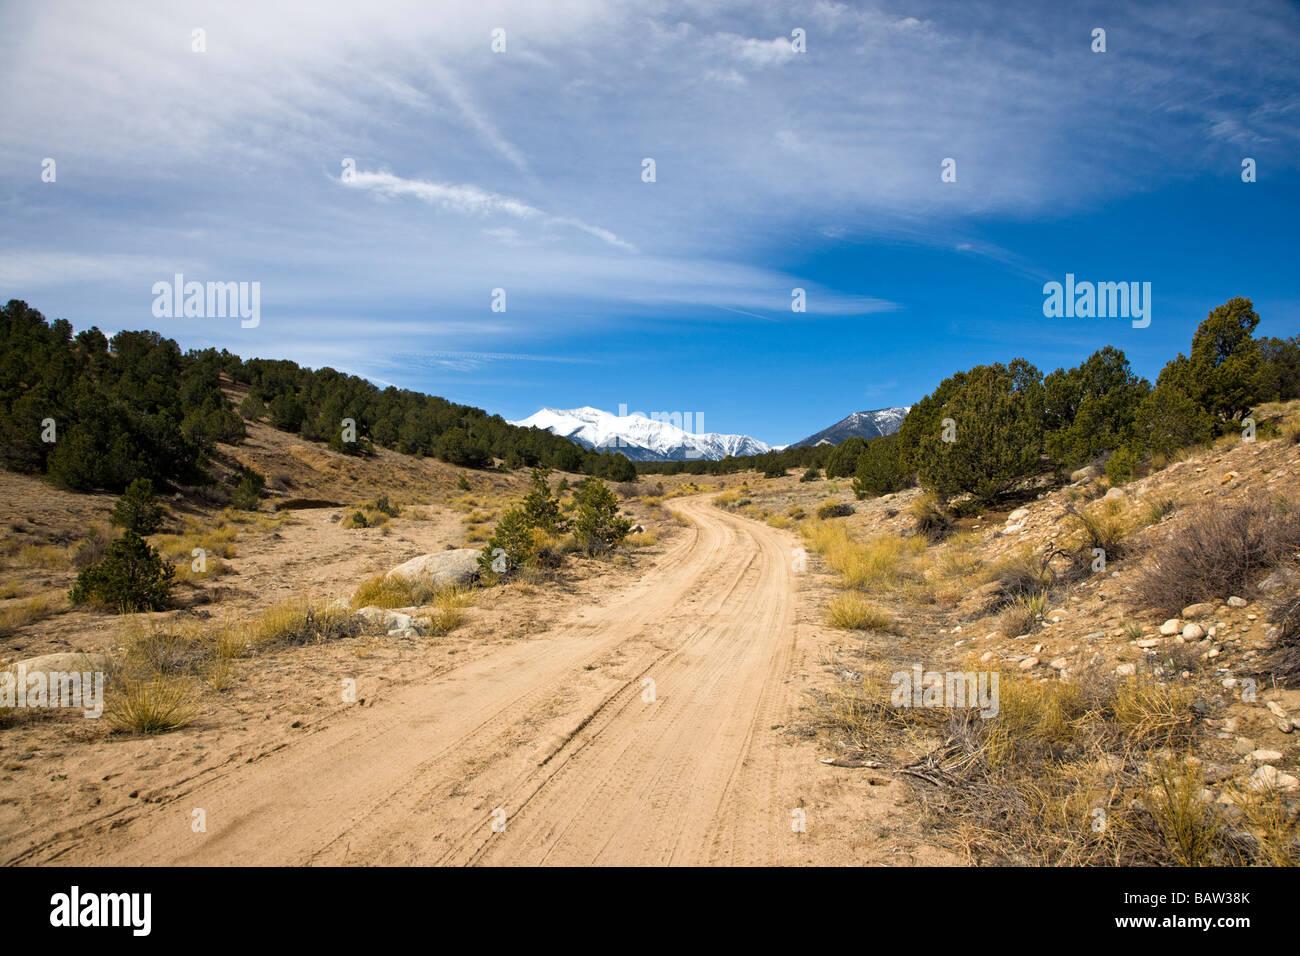 Feldweg in Chaffee County Colorado mit der Stiftskirche Gipfel in der Ferne Stockbild